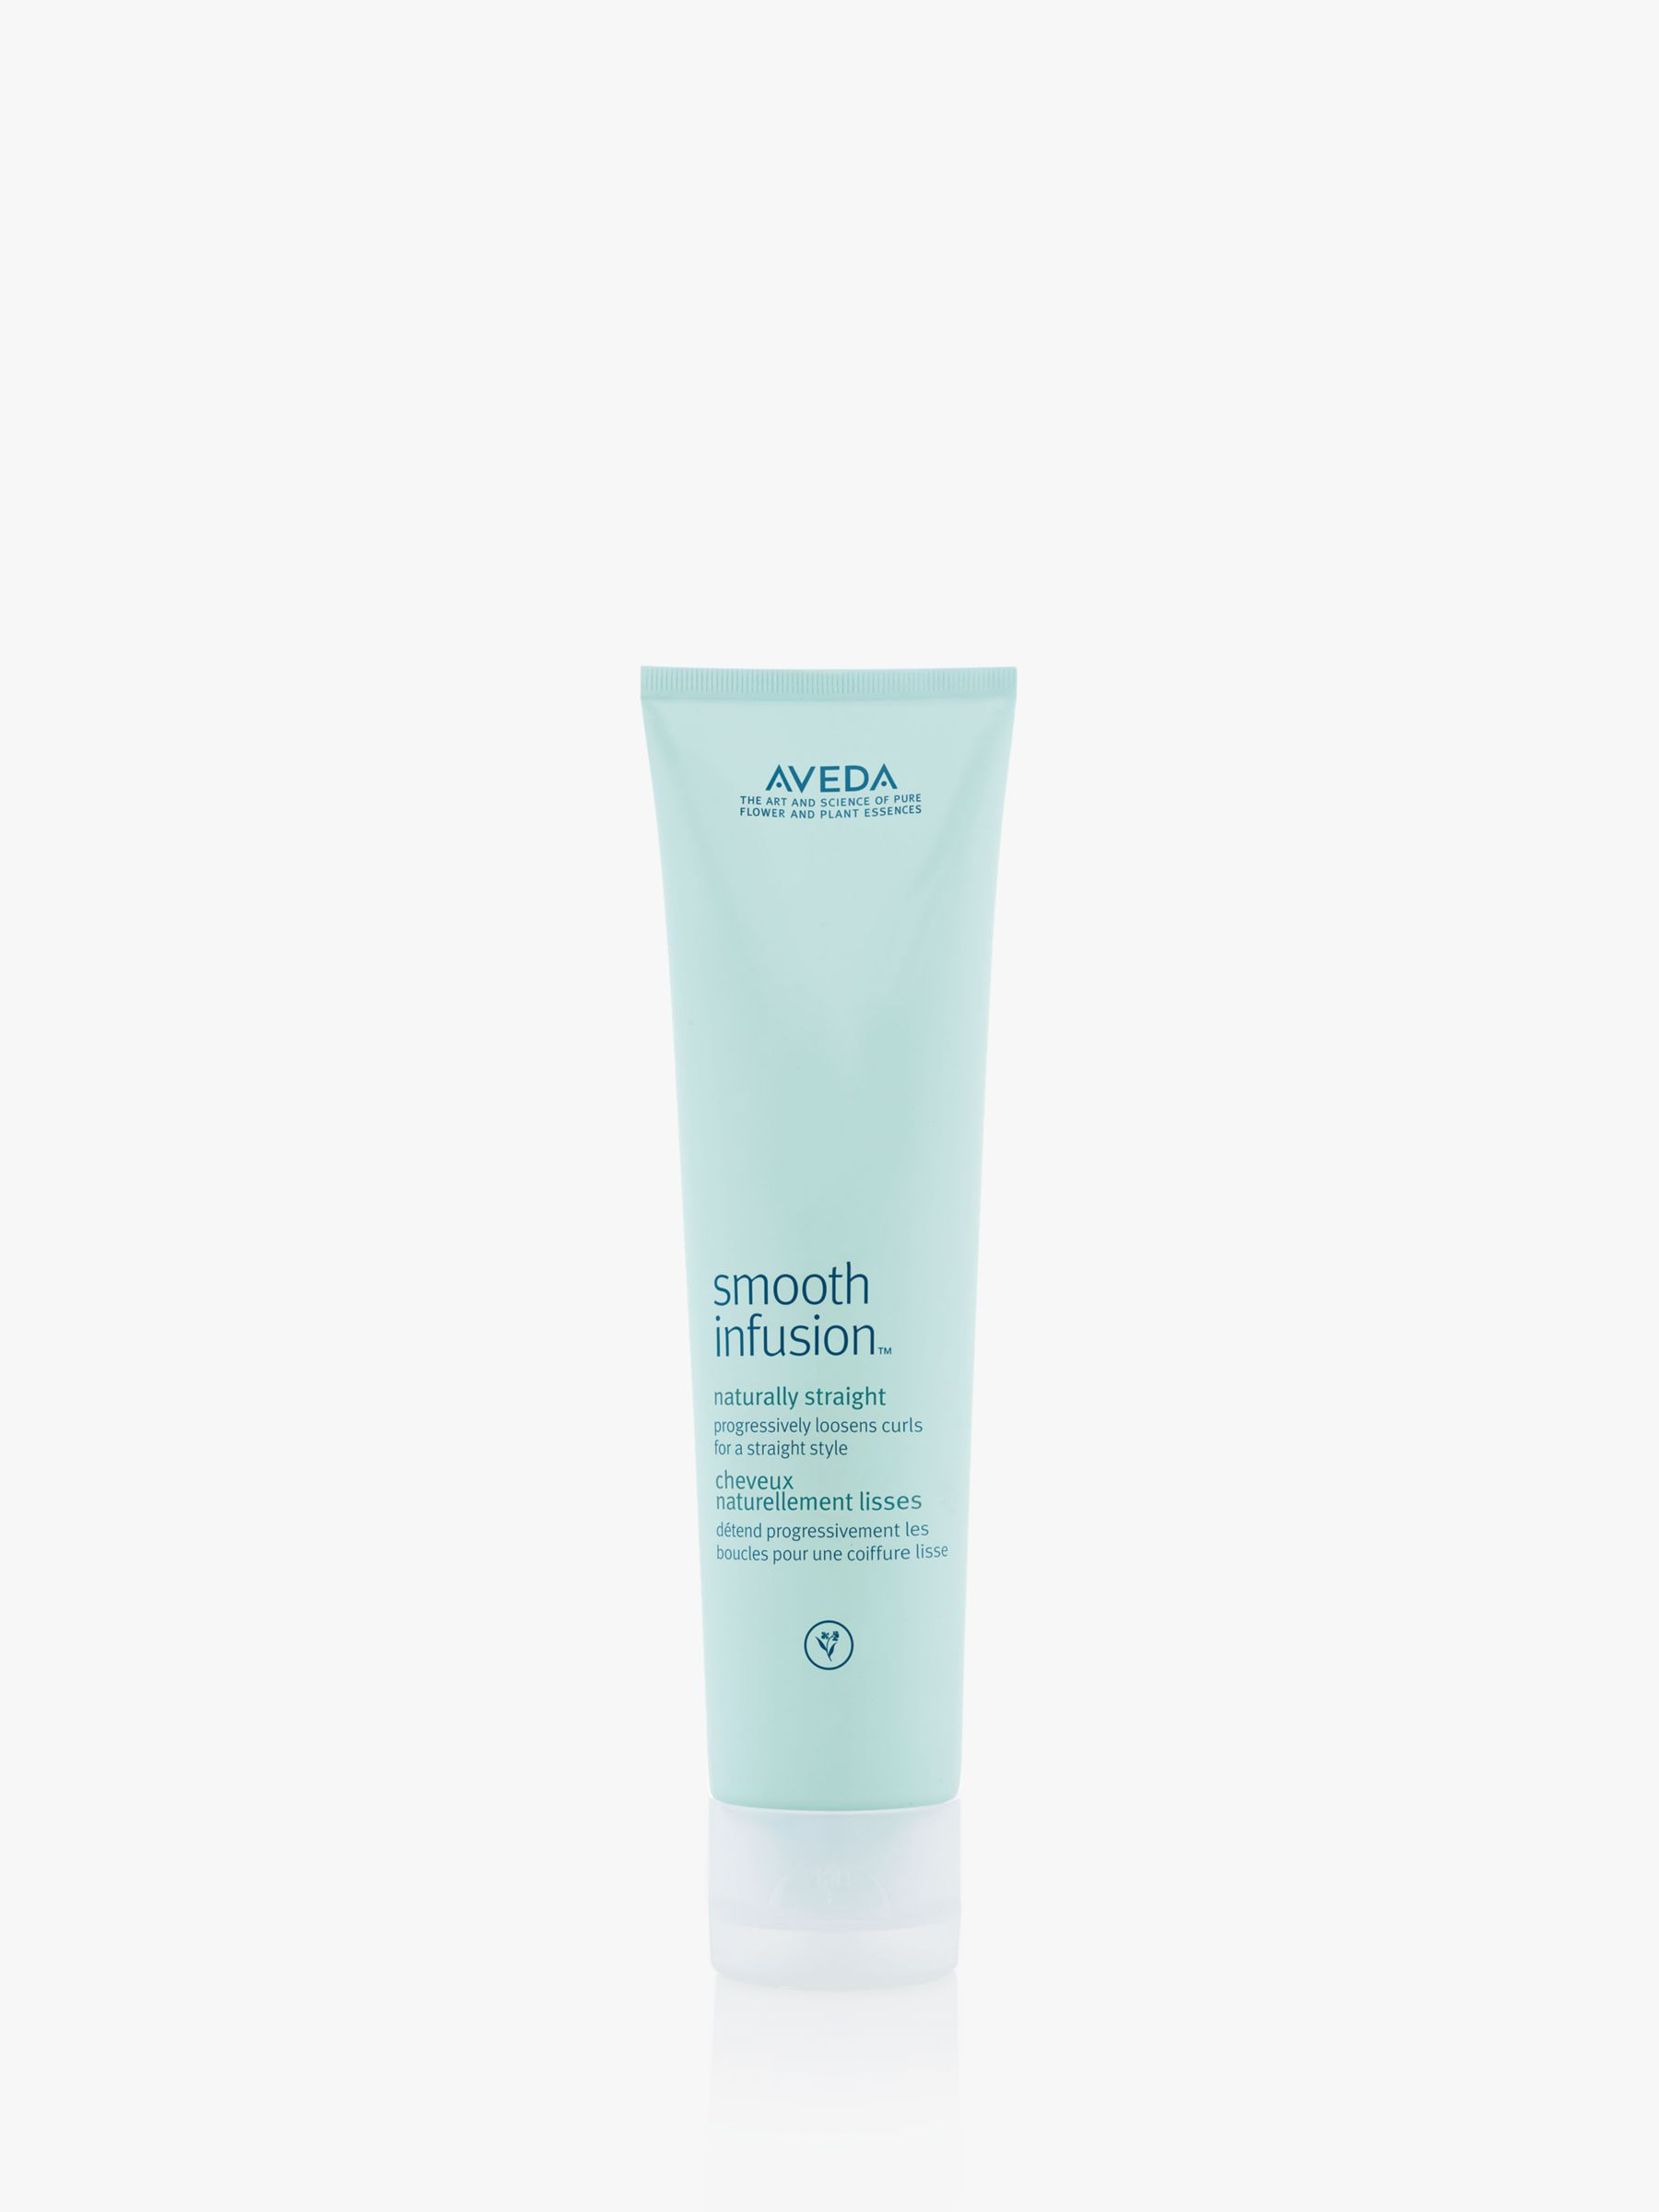 AVEDA Aveda Smooth Infusion™ Natural Straight, 150ml